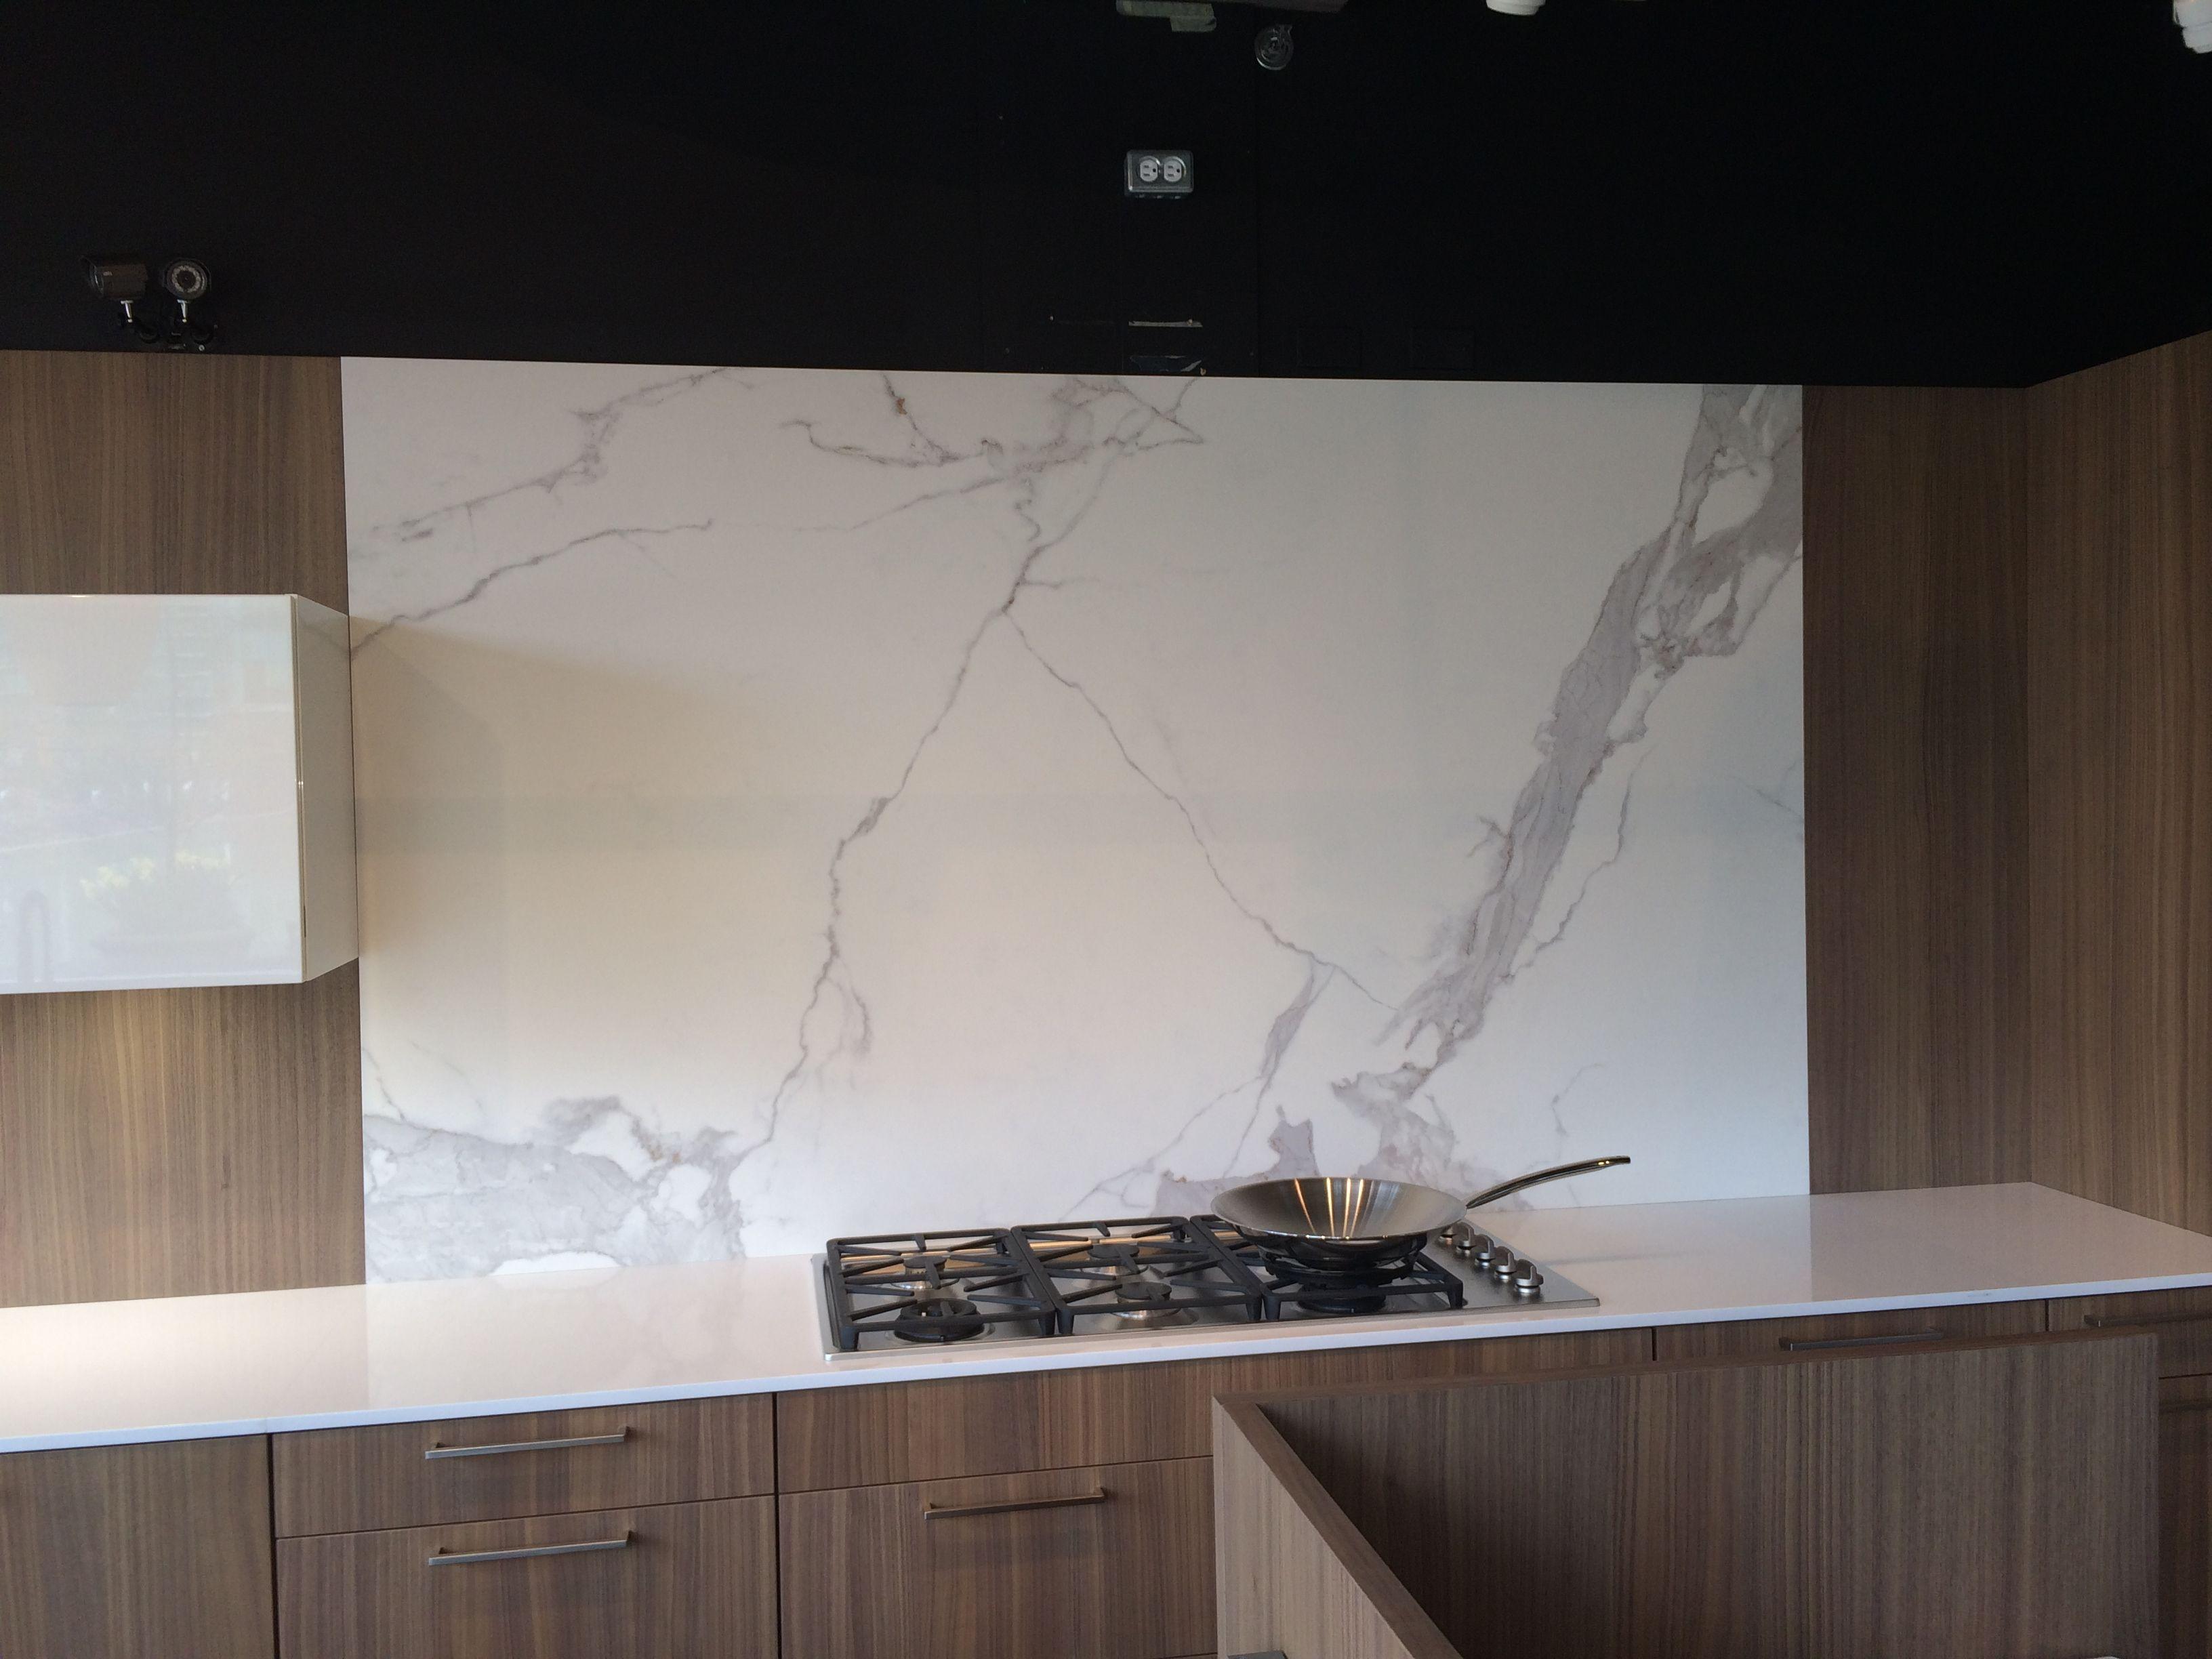 Kitchen Furniture Vancouver Estatuario Neolith Backsplash In The Ultimate Kitchens Showroom